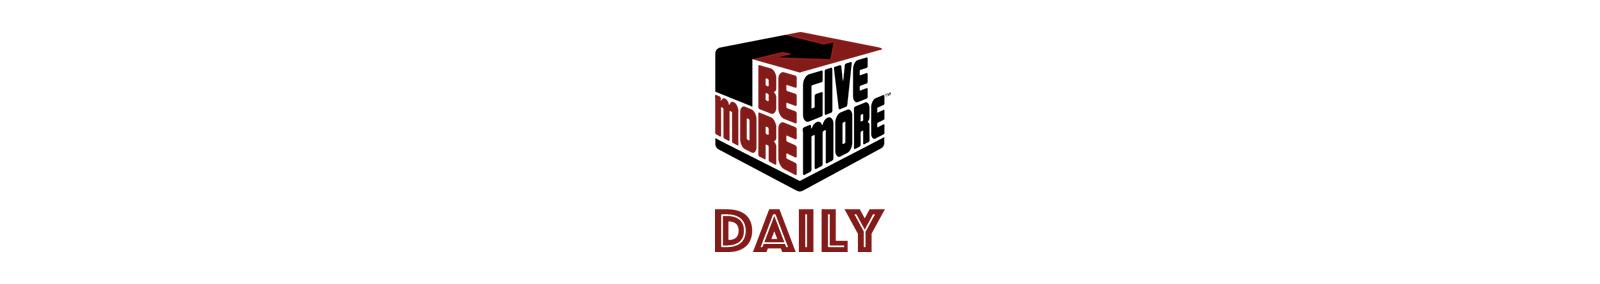 bmgm-daily-site-header.jpg